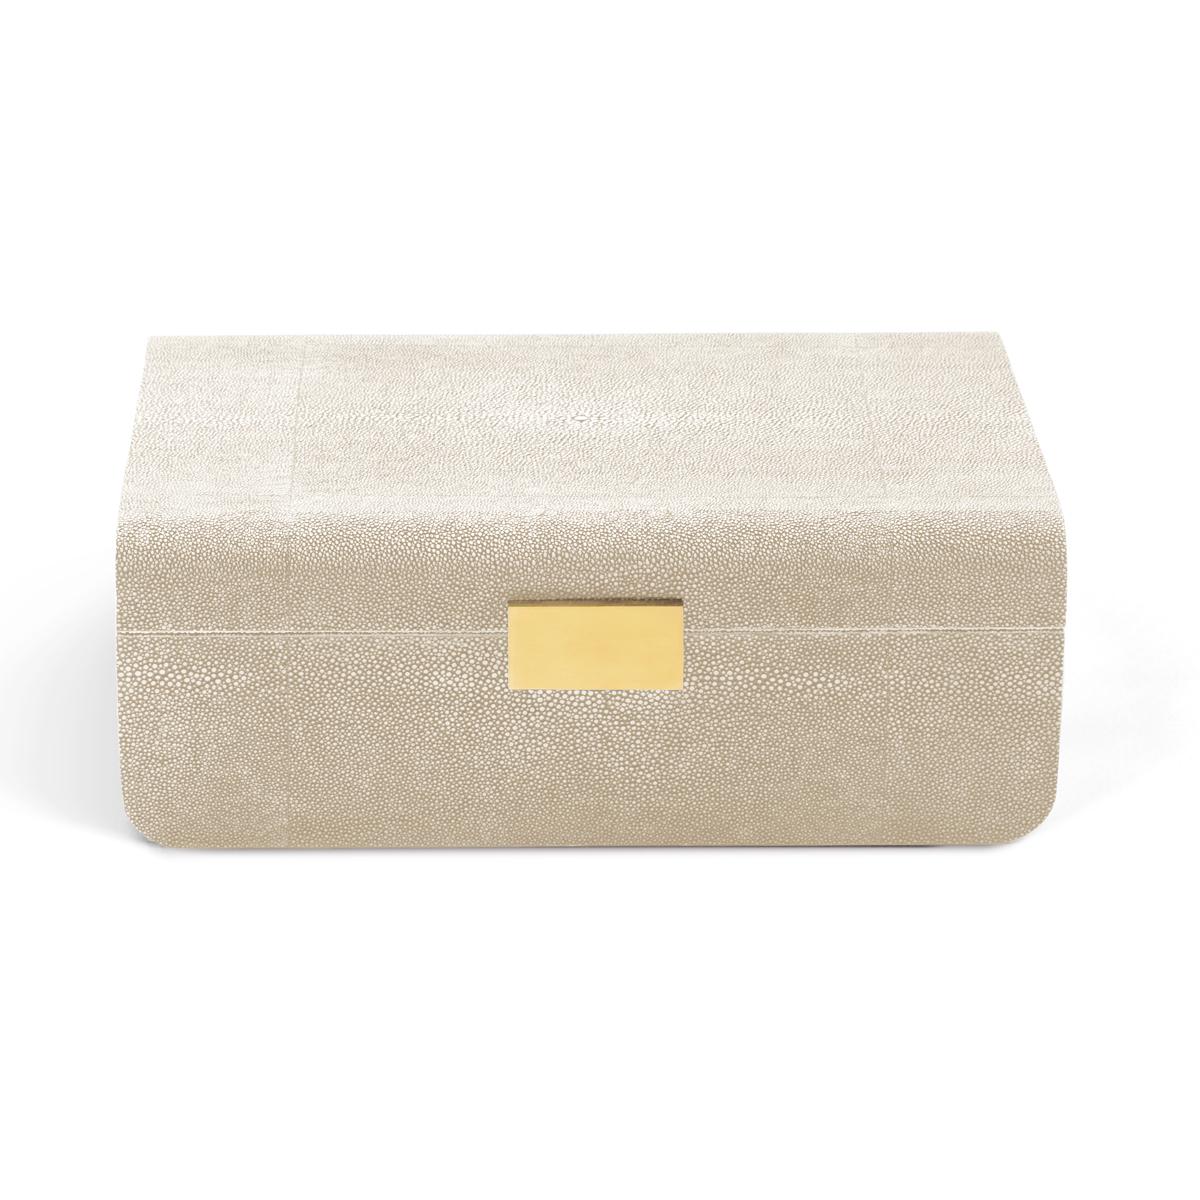 Aerin Modern Shagreen Large Jewelry Box, Wheat